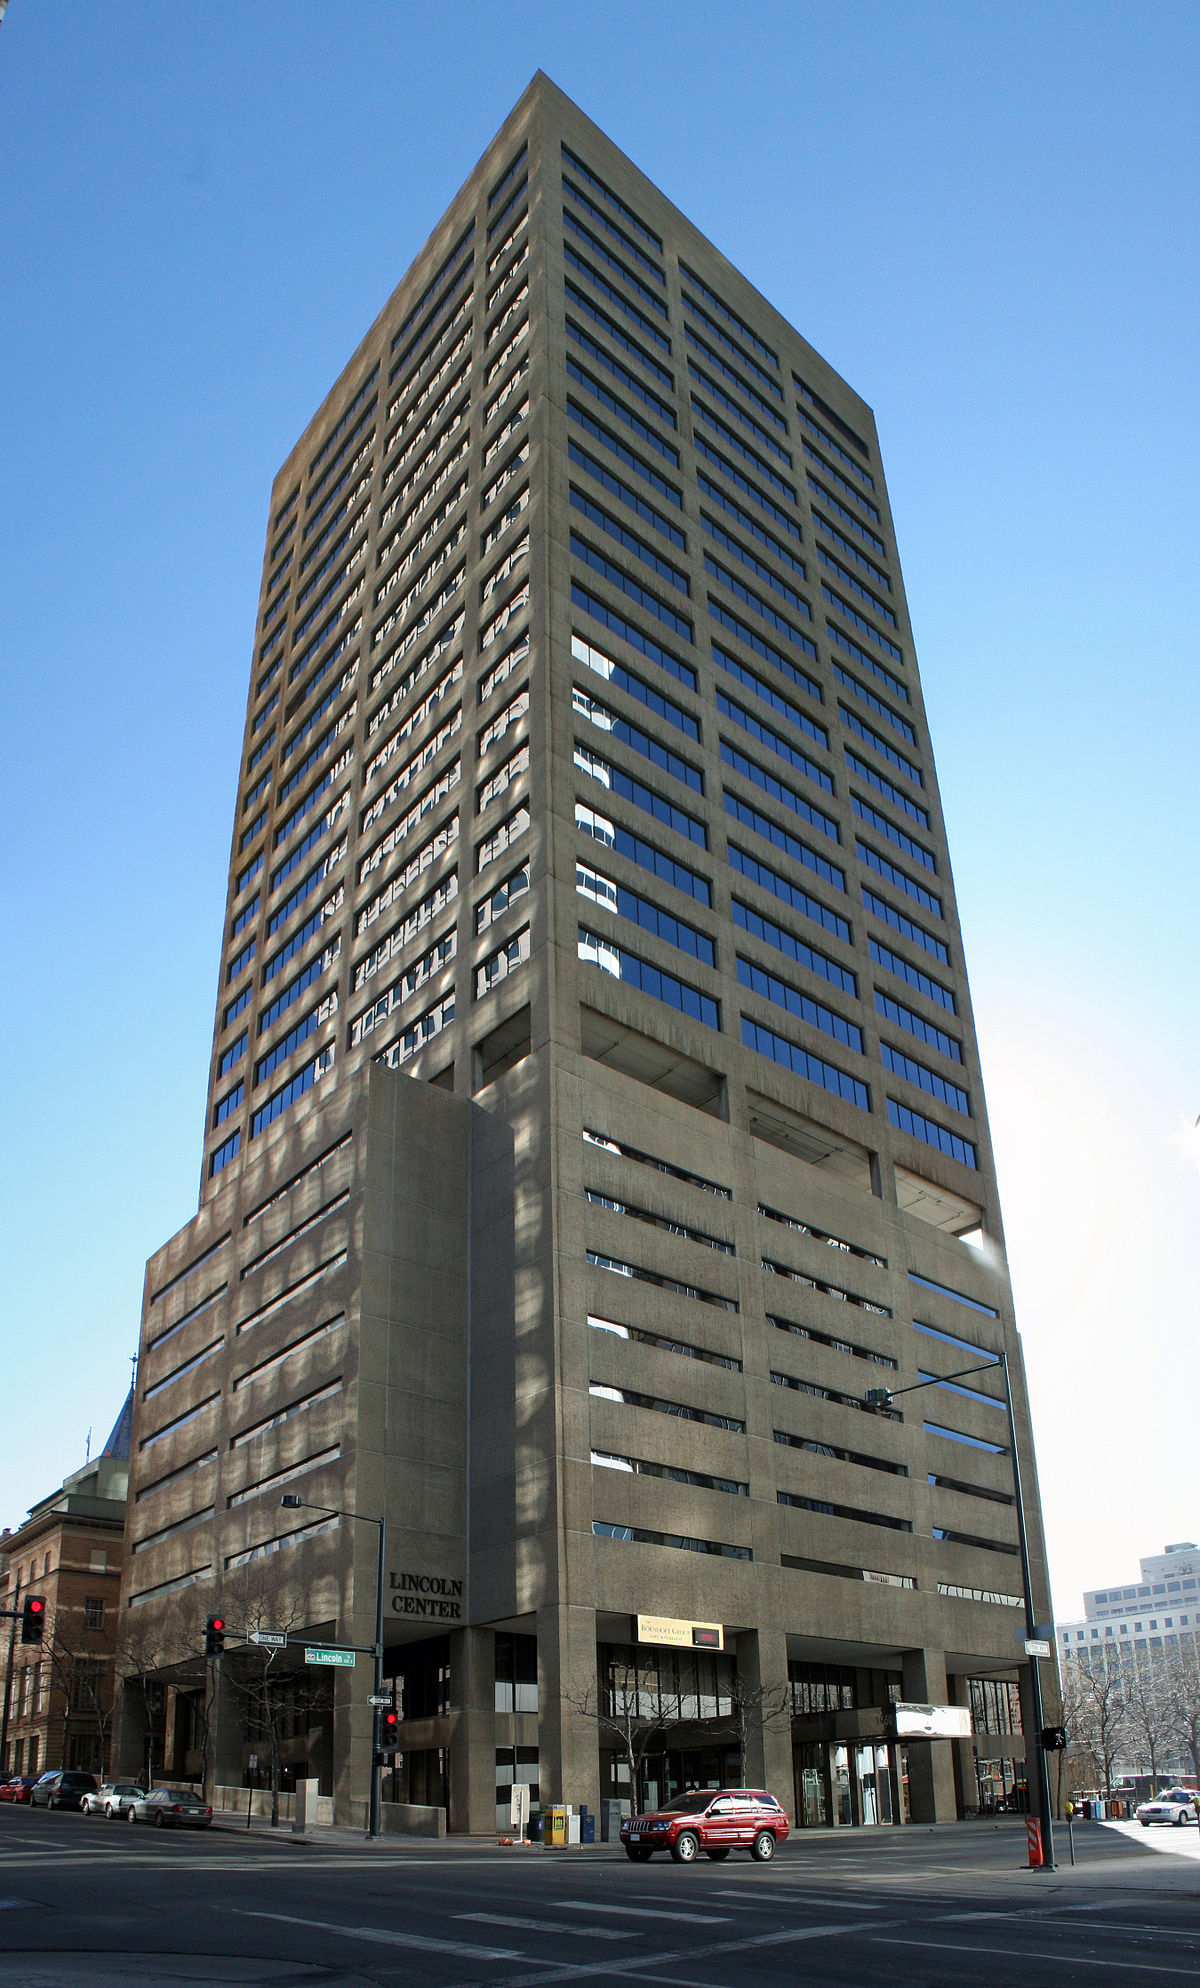 Black Marble Buildings : Lincoln center denver wikipedia